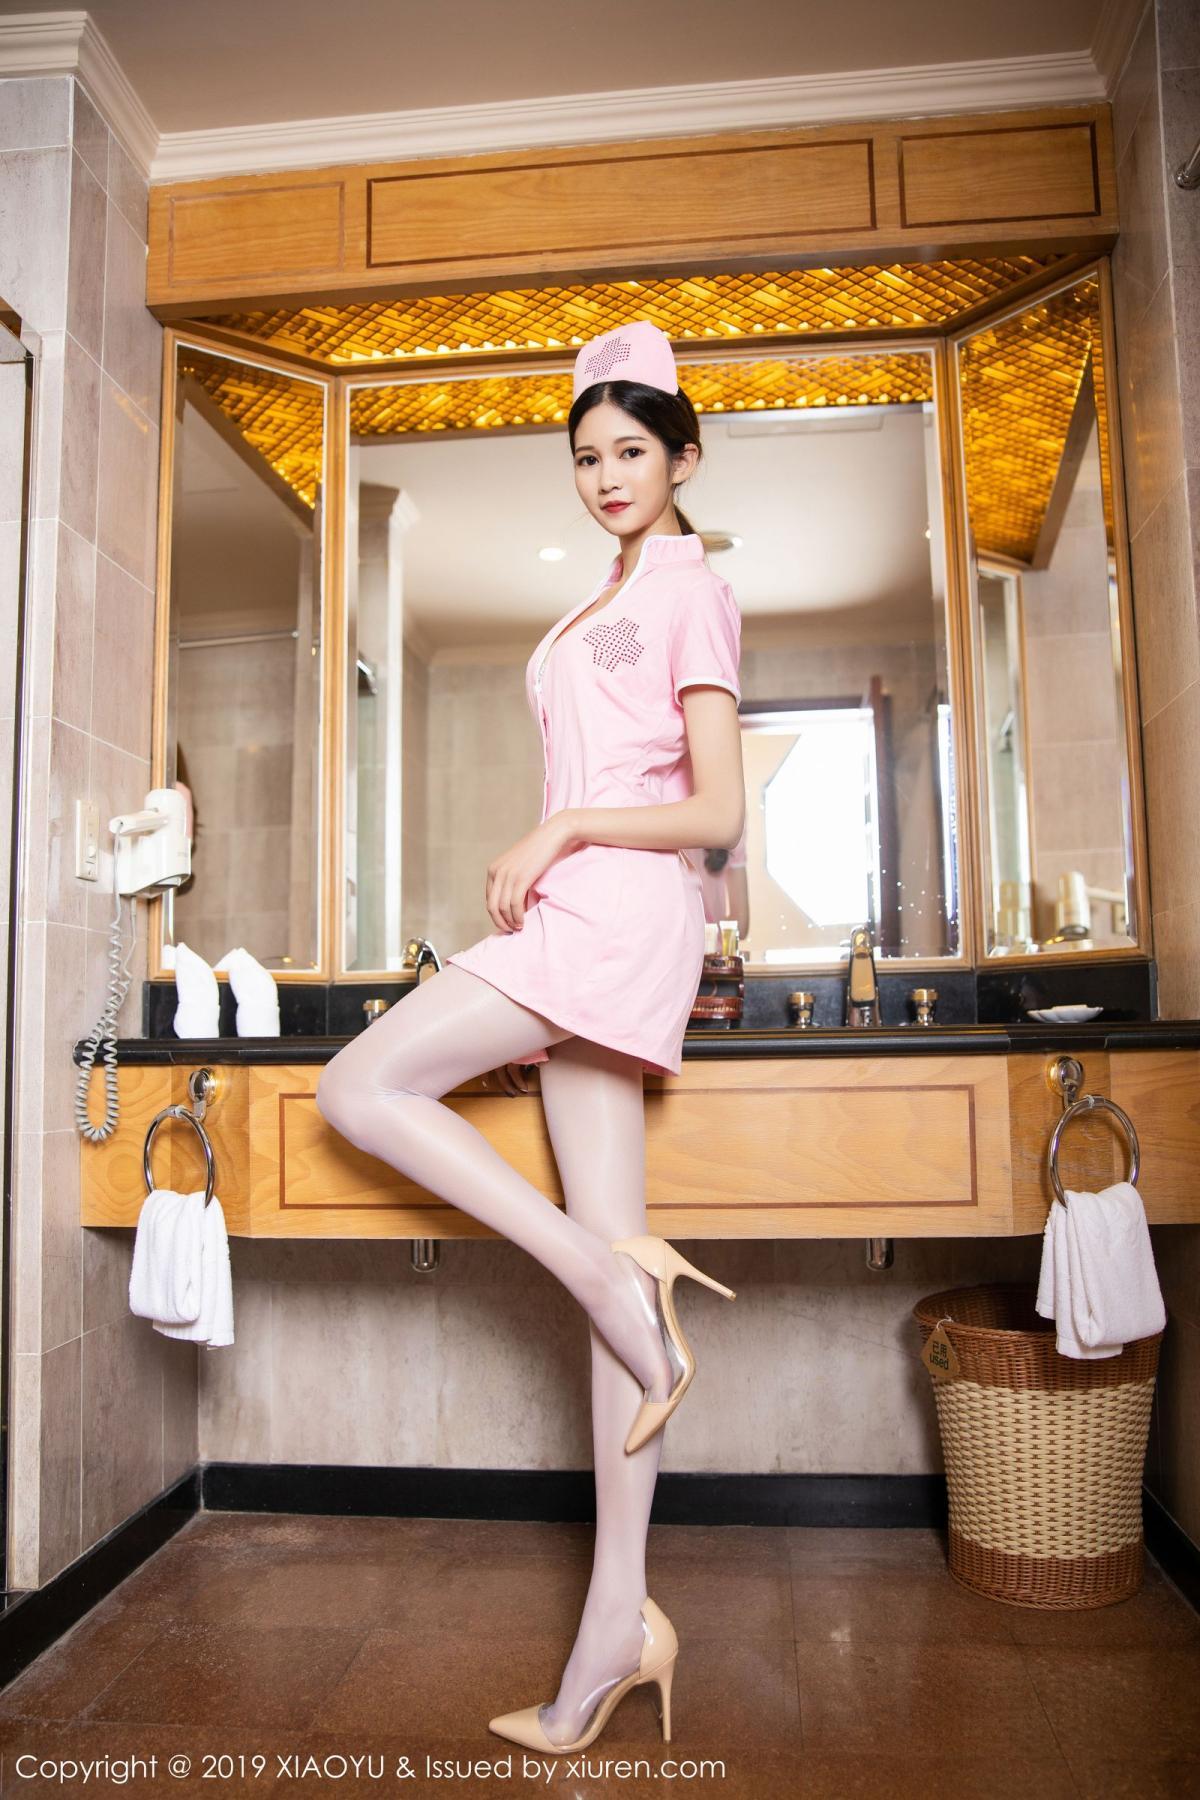 [XiaoYu] Vol.218 Cheng Cheng Cheng 3P, Cheng Cheng Cheng, Nurse, Tall, XiaoYu